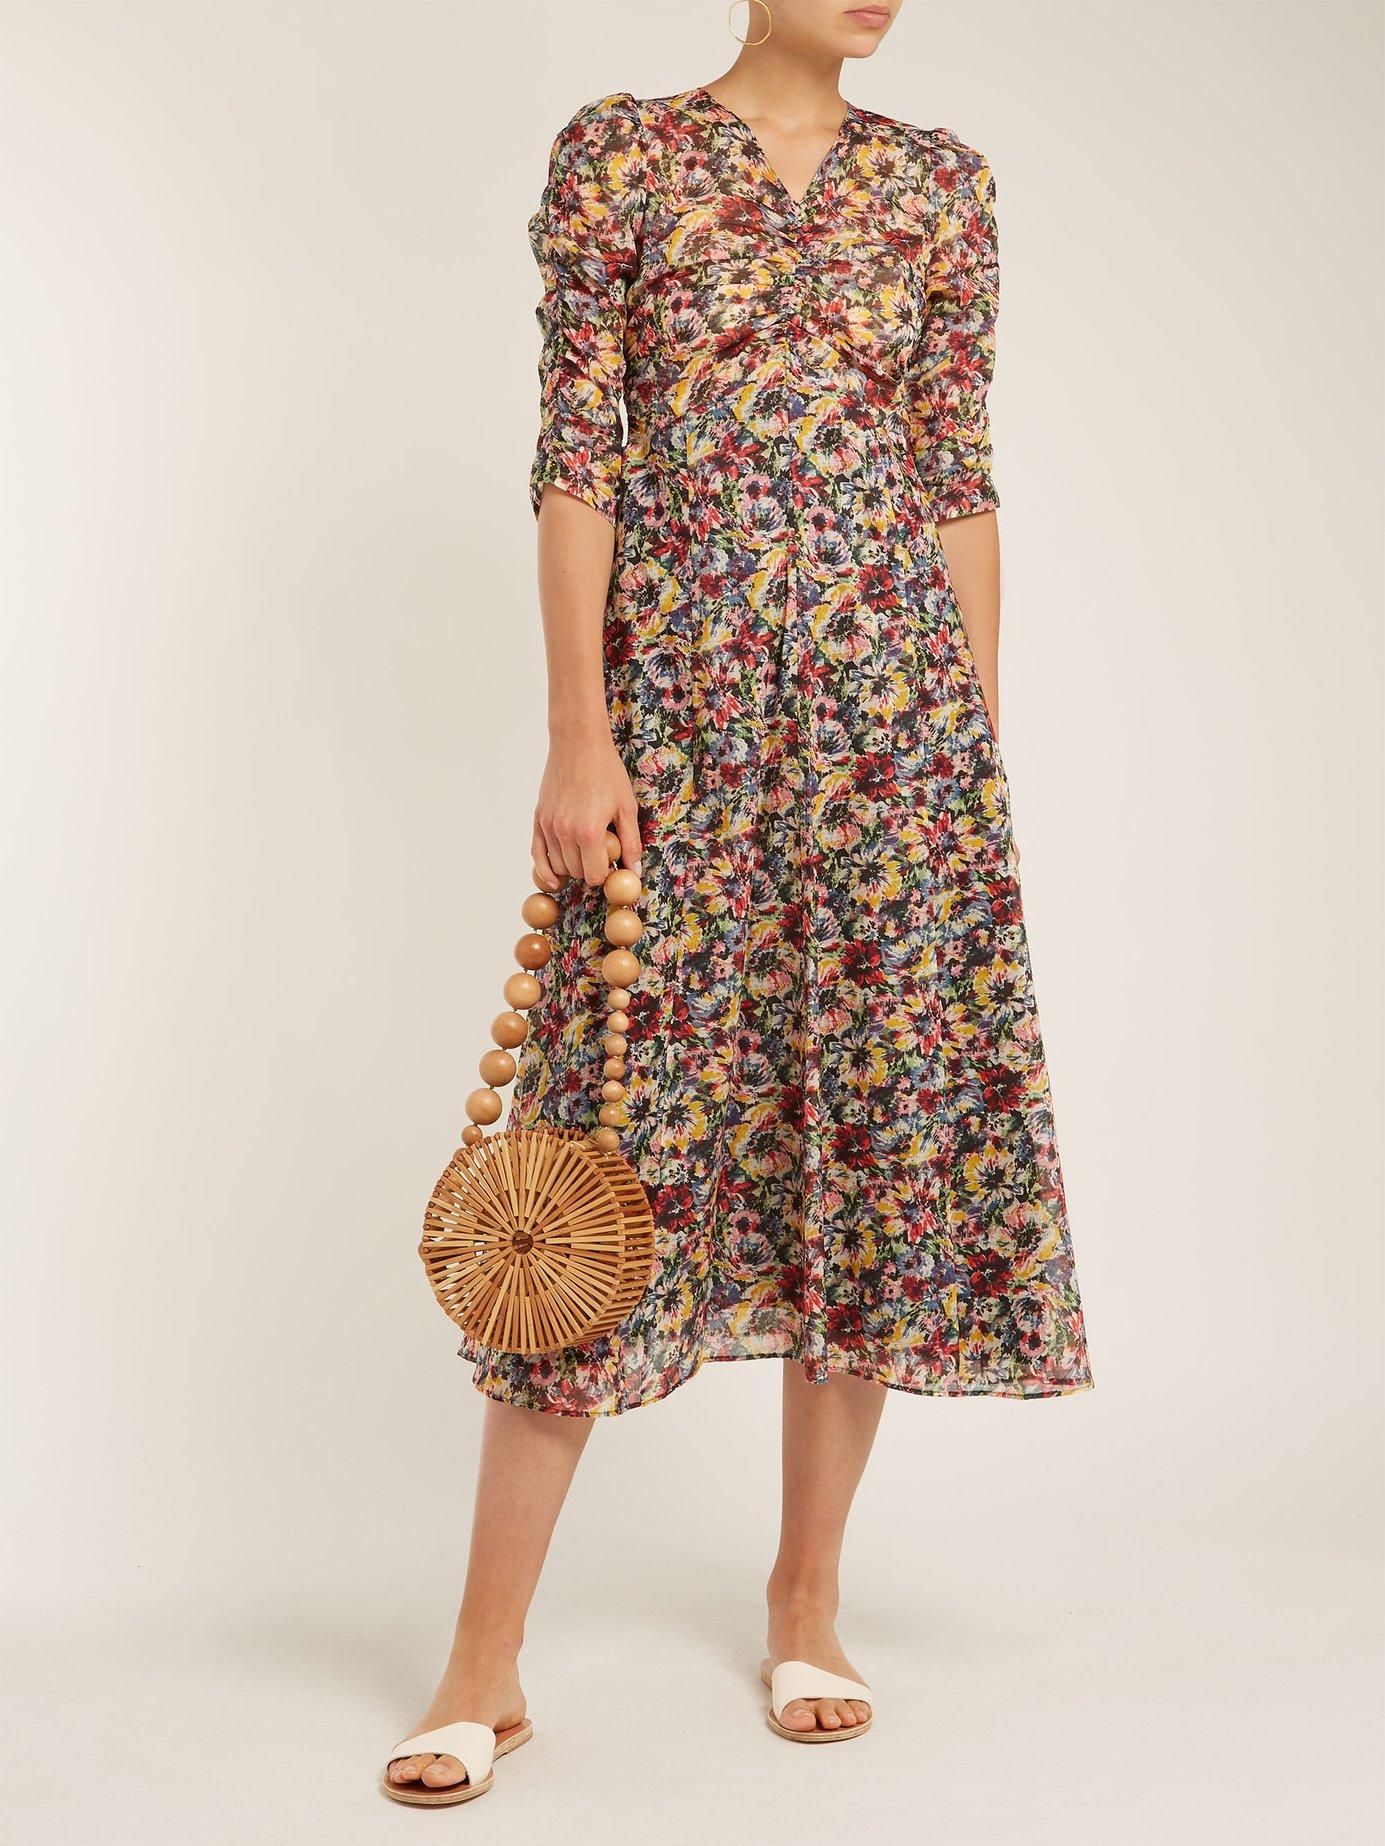 Mina rose-print cotton midi dress by Masscob